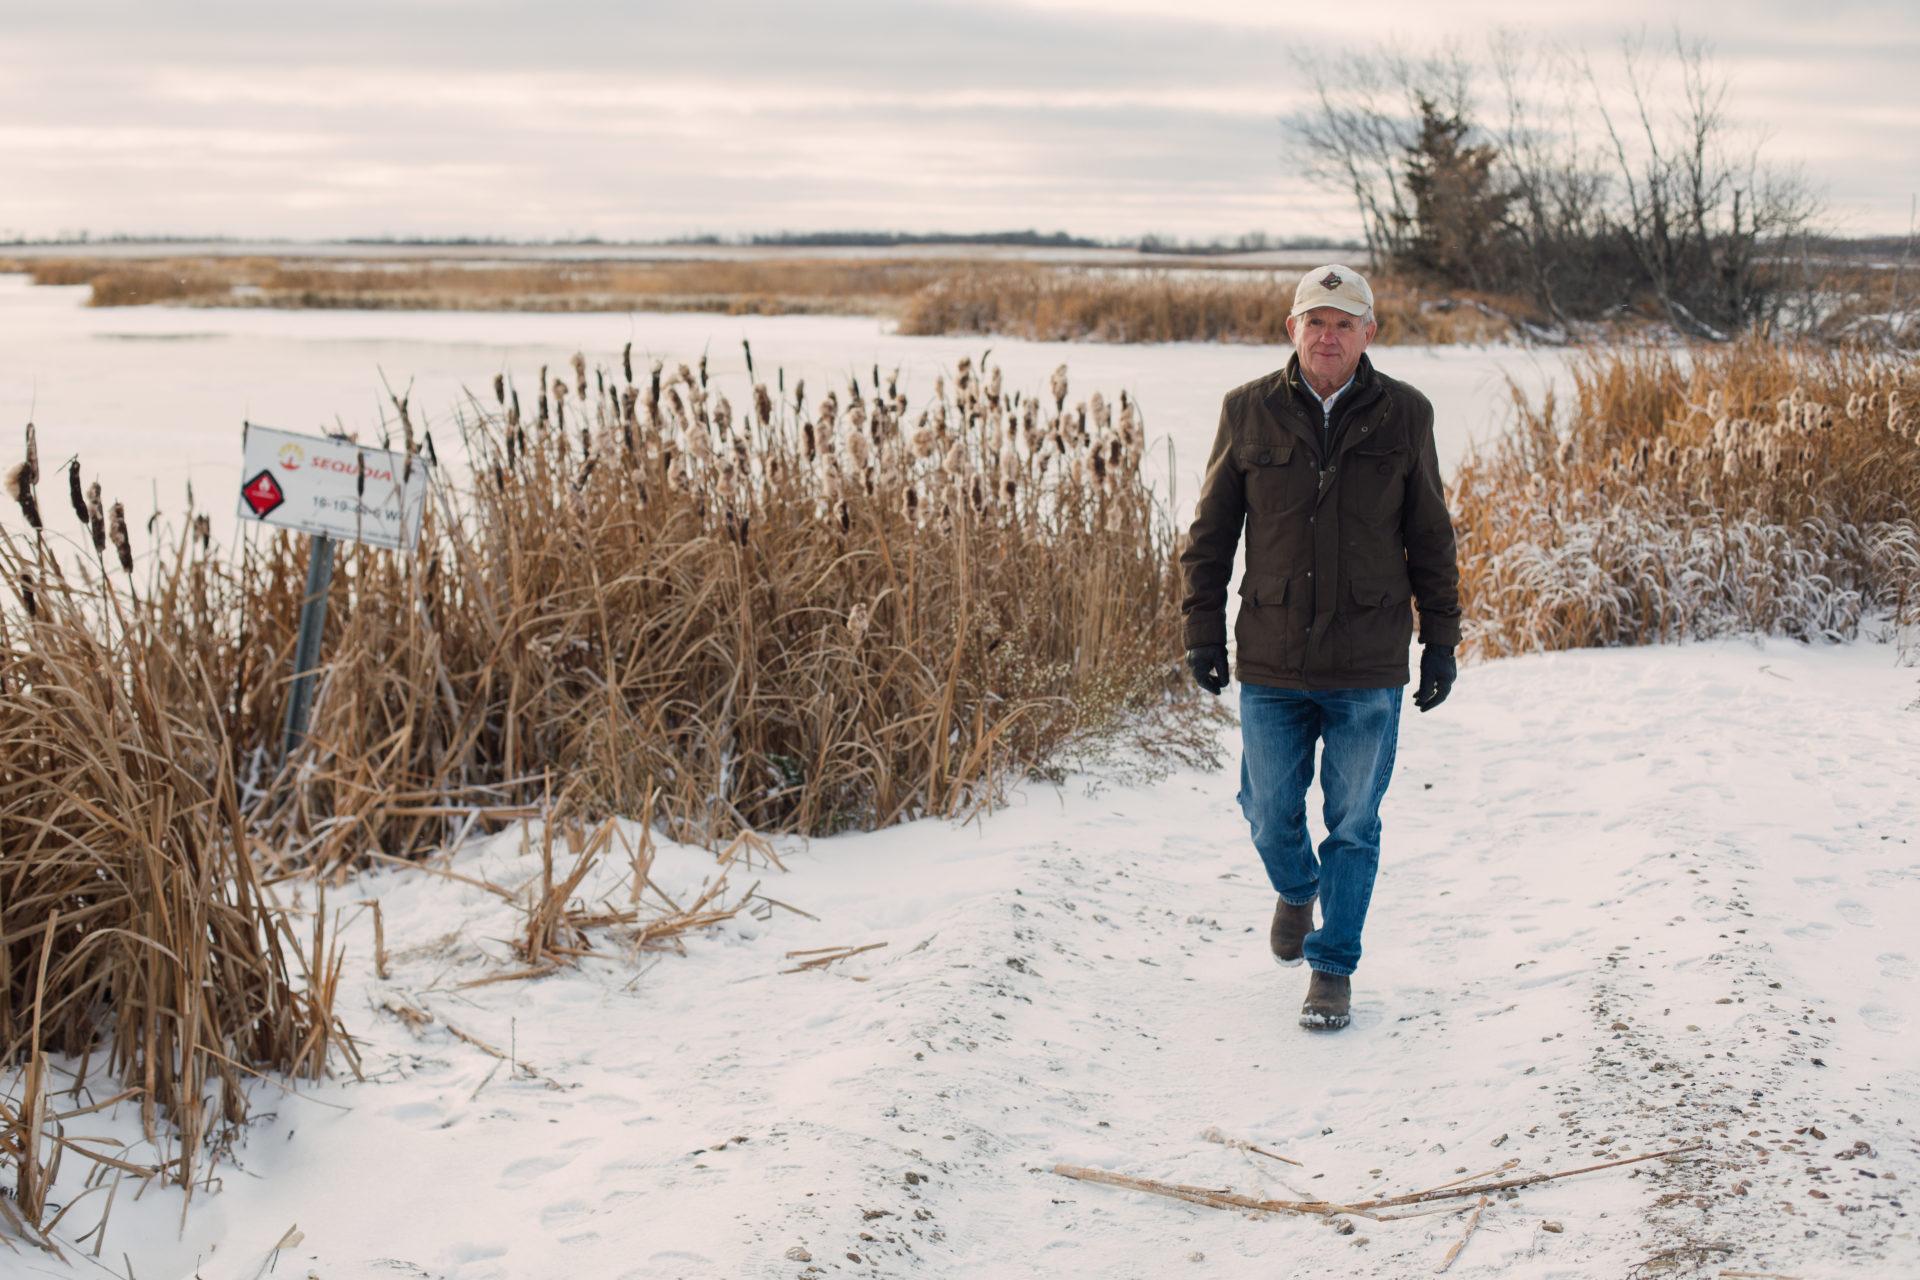 Mike Smith in Wetaskiwin, Alberta on Monday, November 5, 2018. Amber Bracken